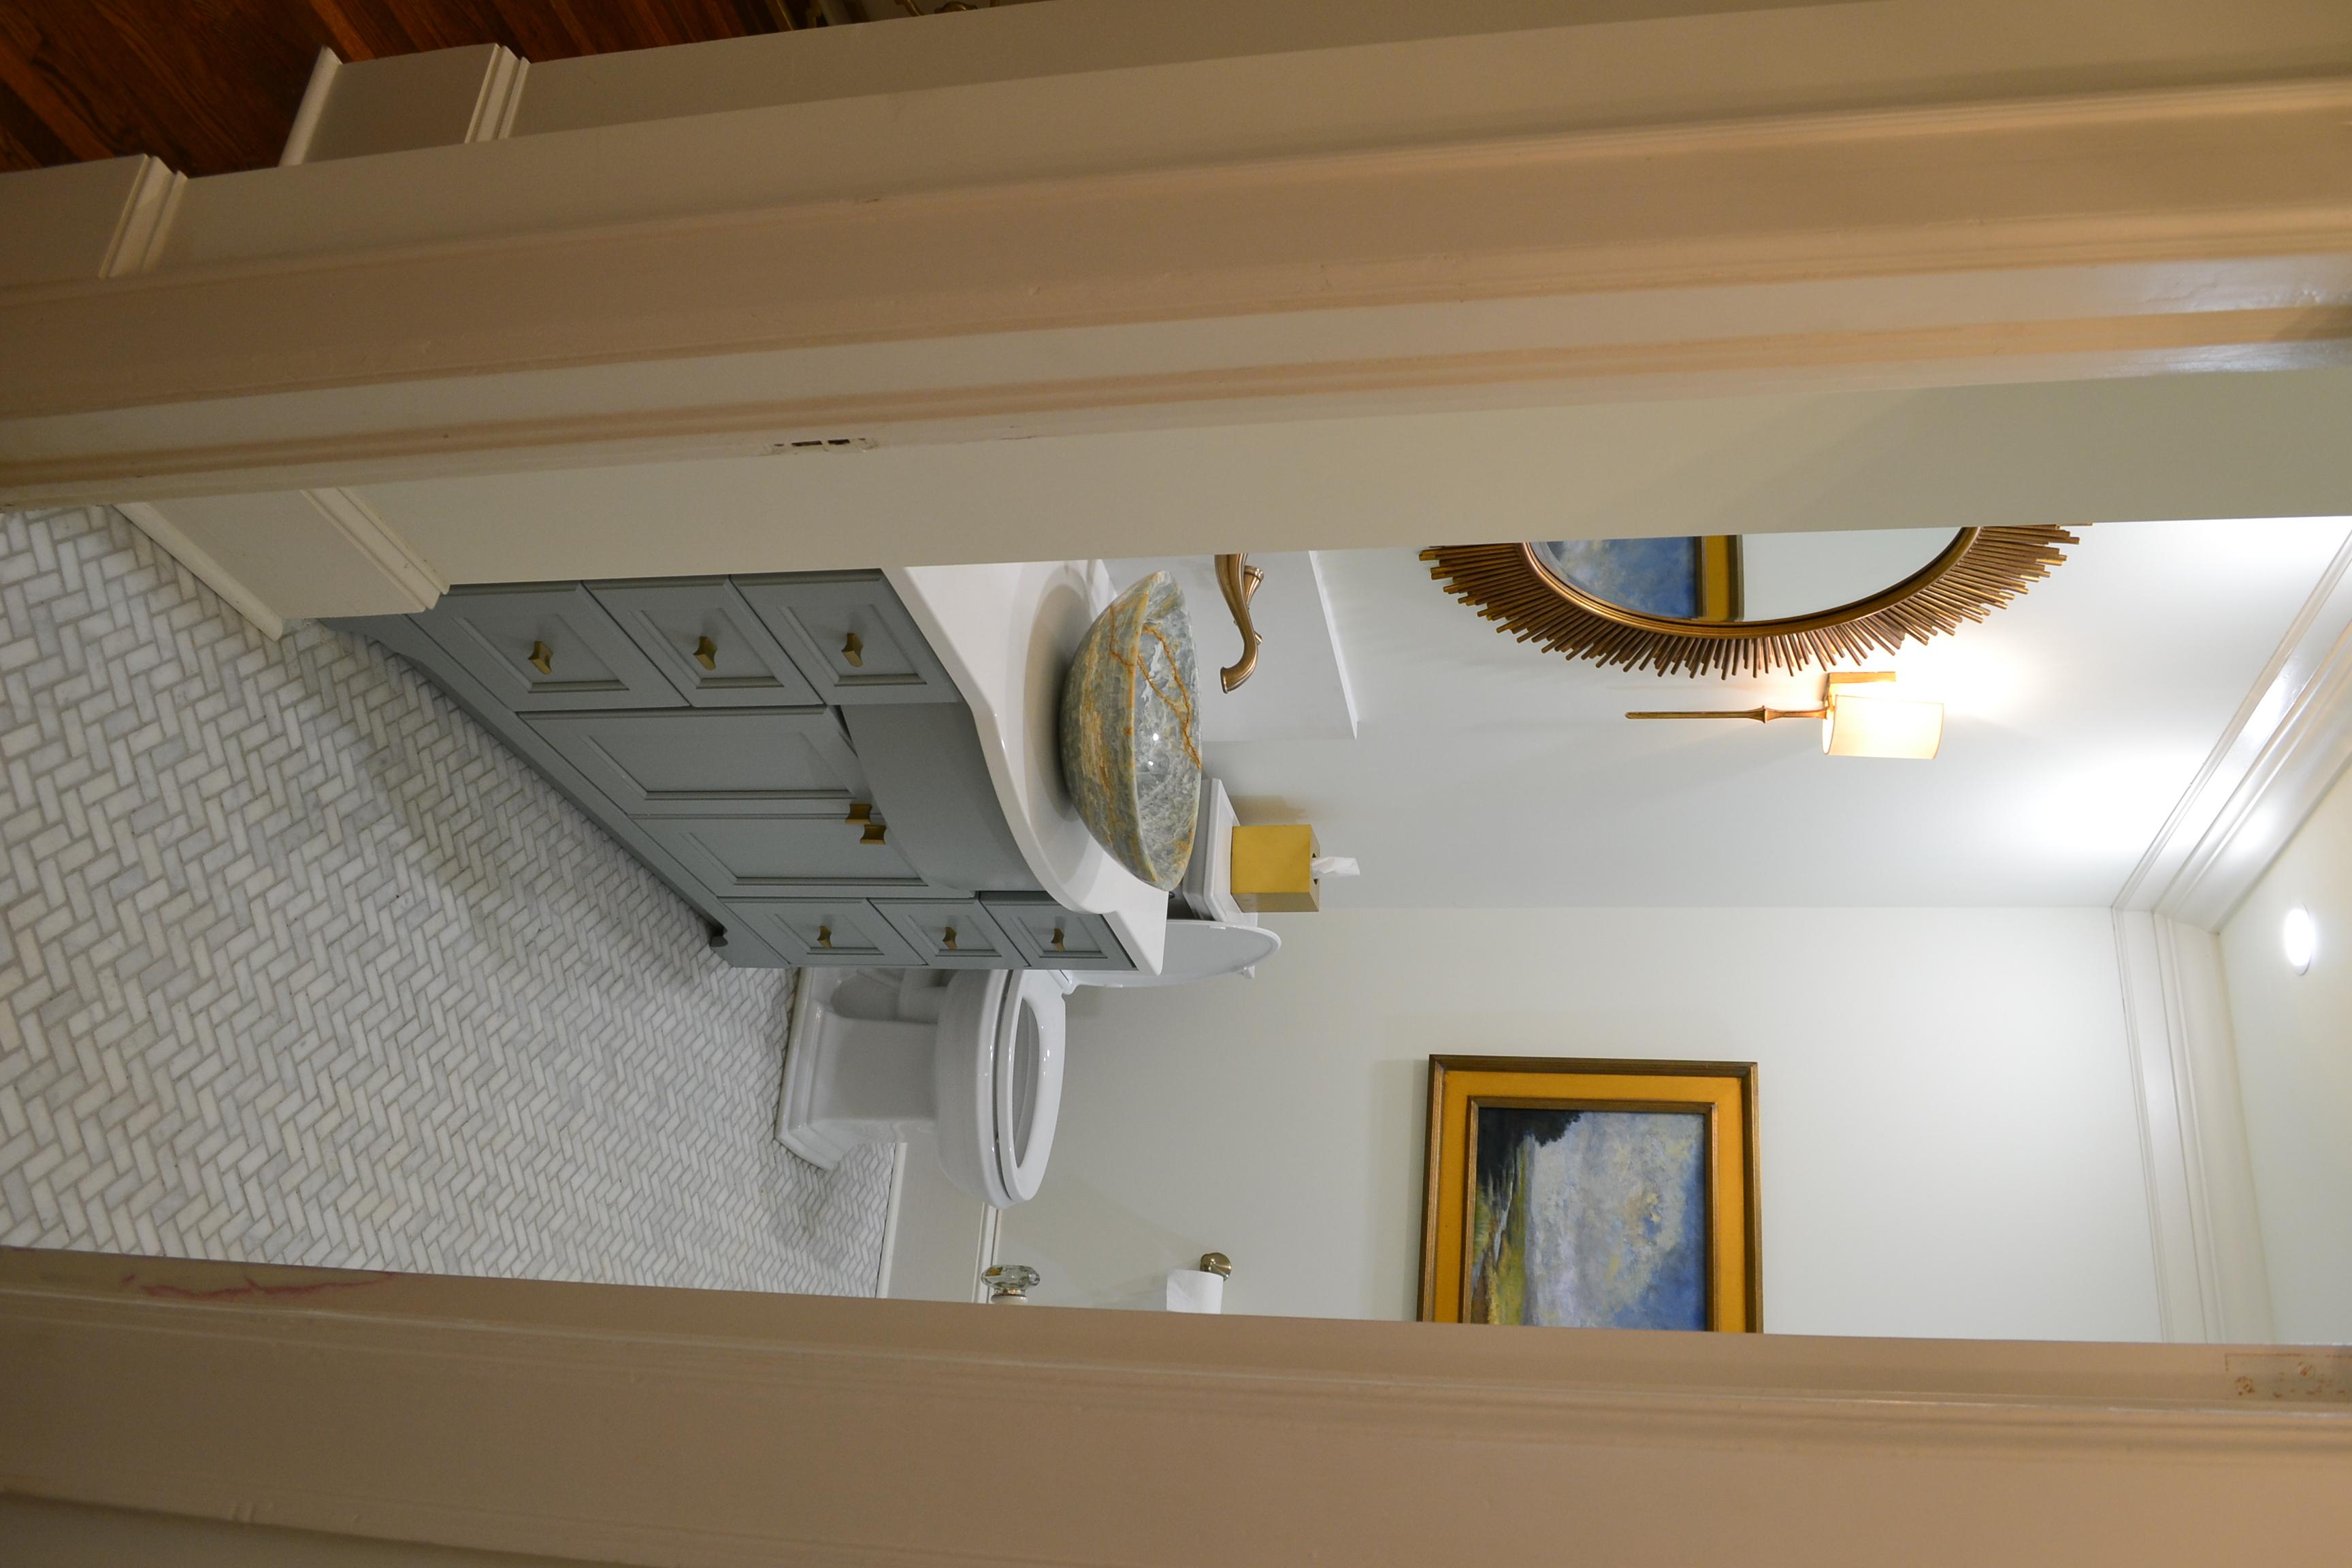 hall bath after